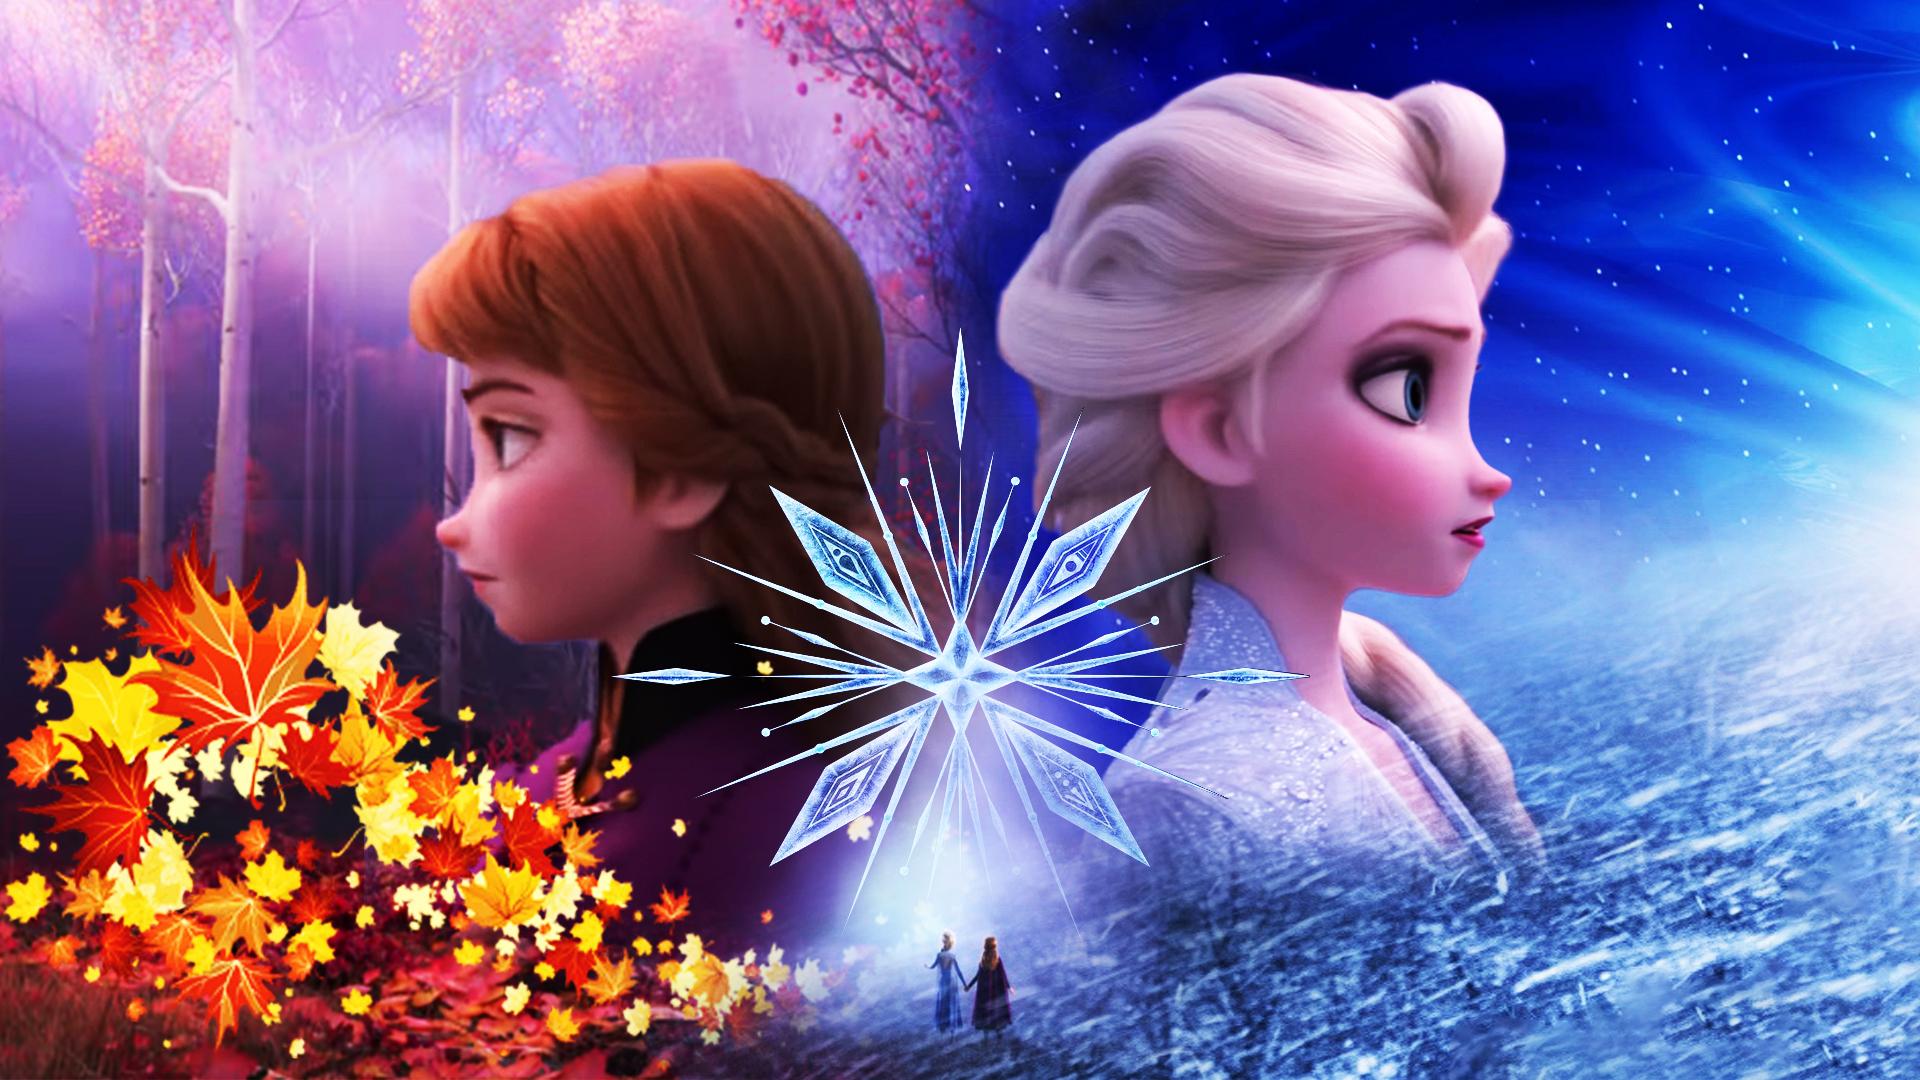 Frozen II Wallpaper by The-Dark-Mamba-995 on DeviantArt